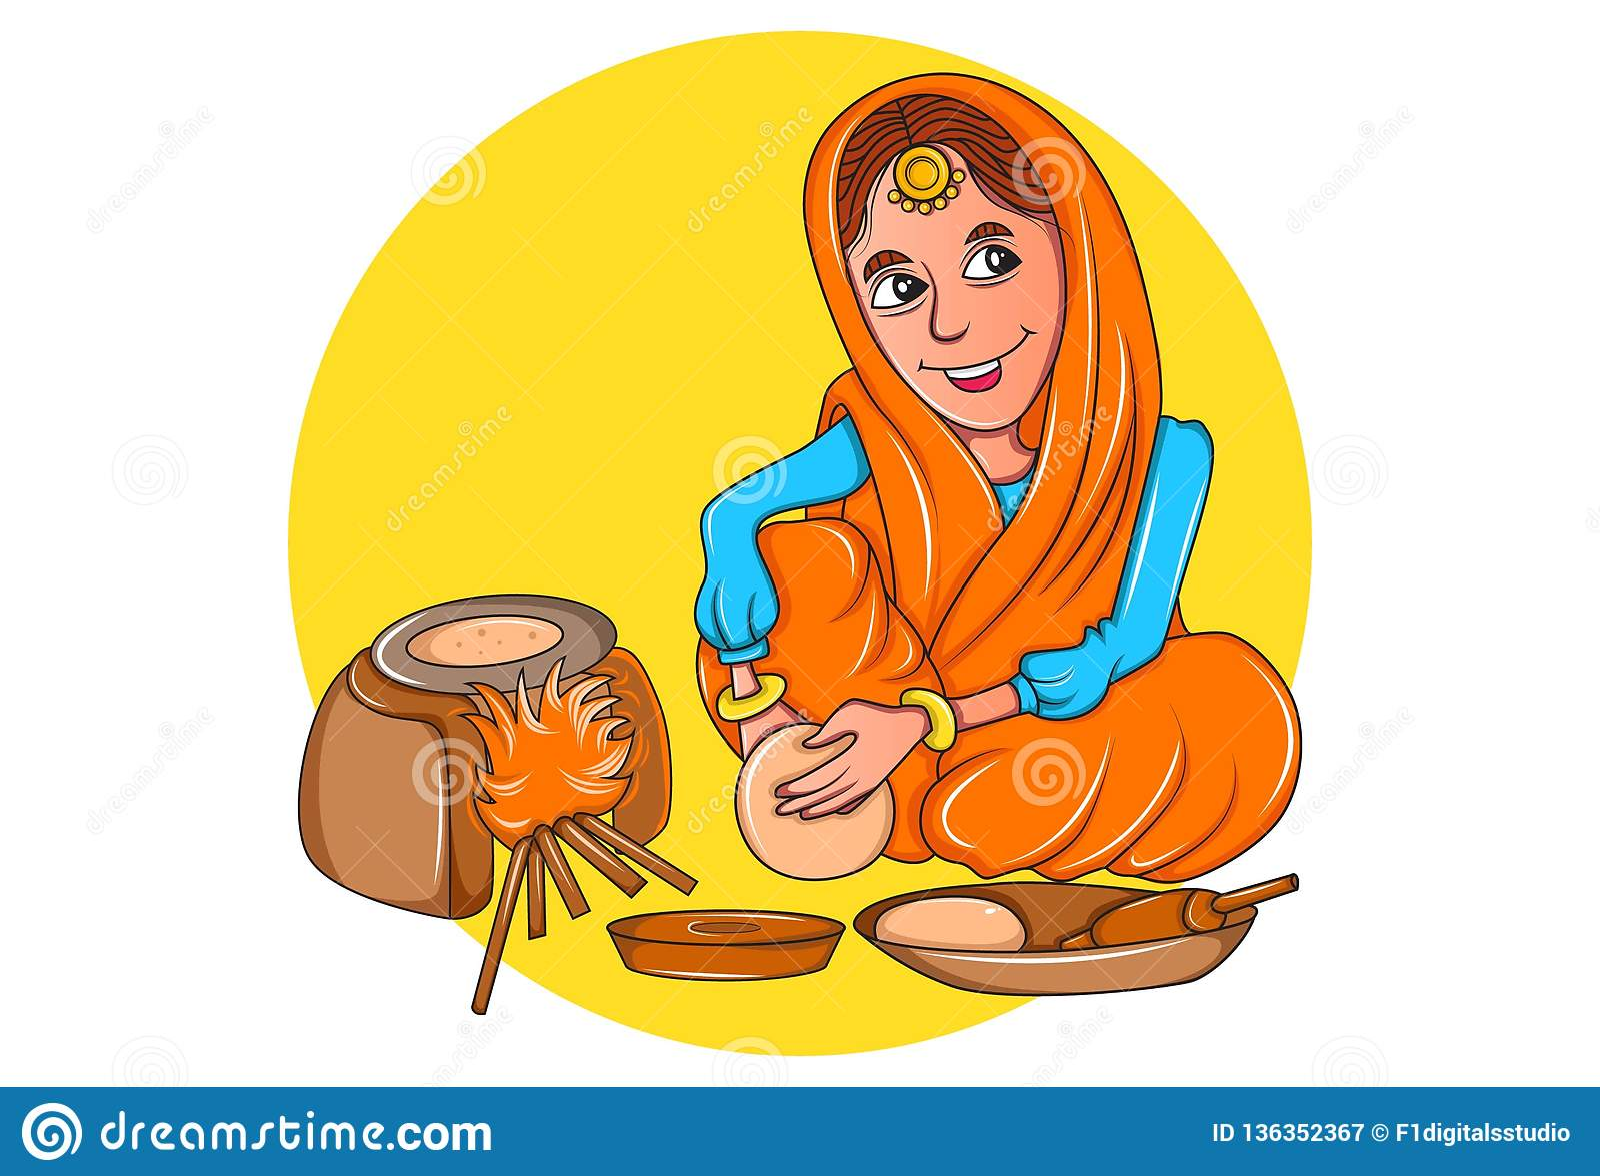 Illustration Of Cartoon Punjabi Woman Stock Illustration Illustration Of Funny Character 136352367